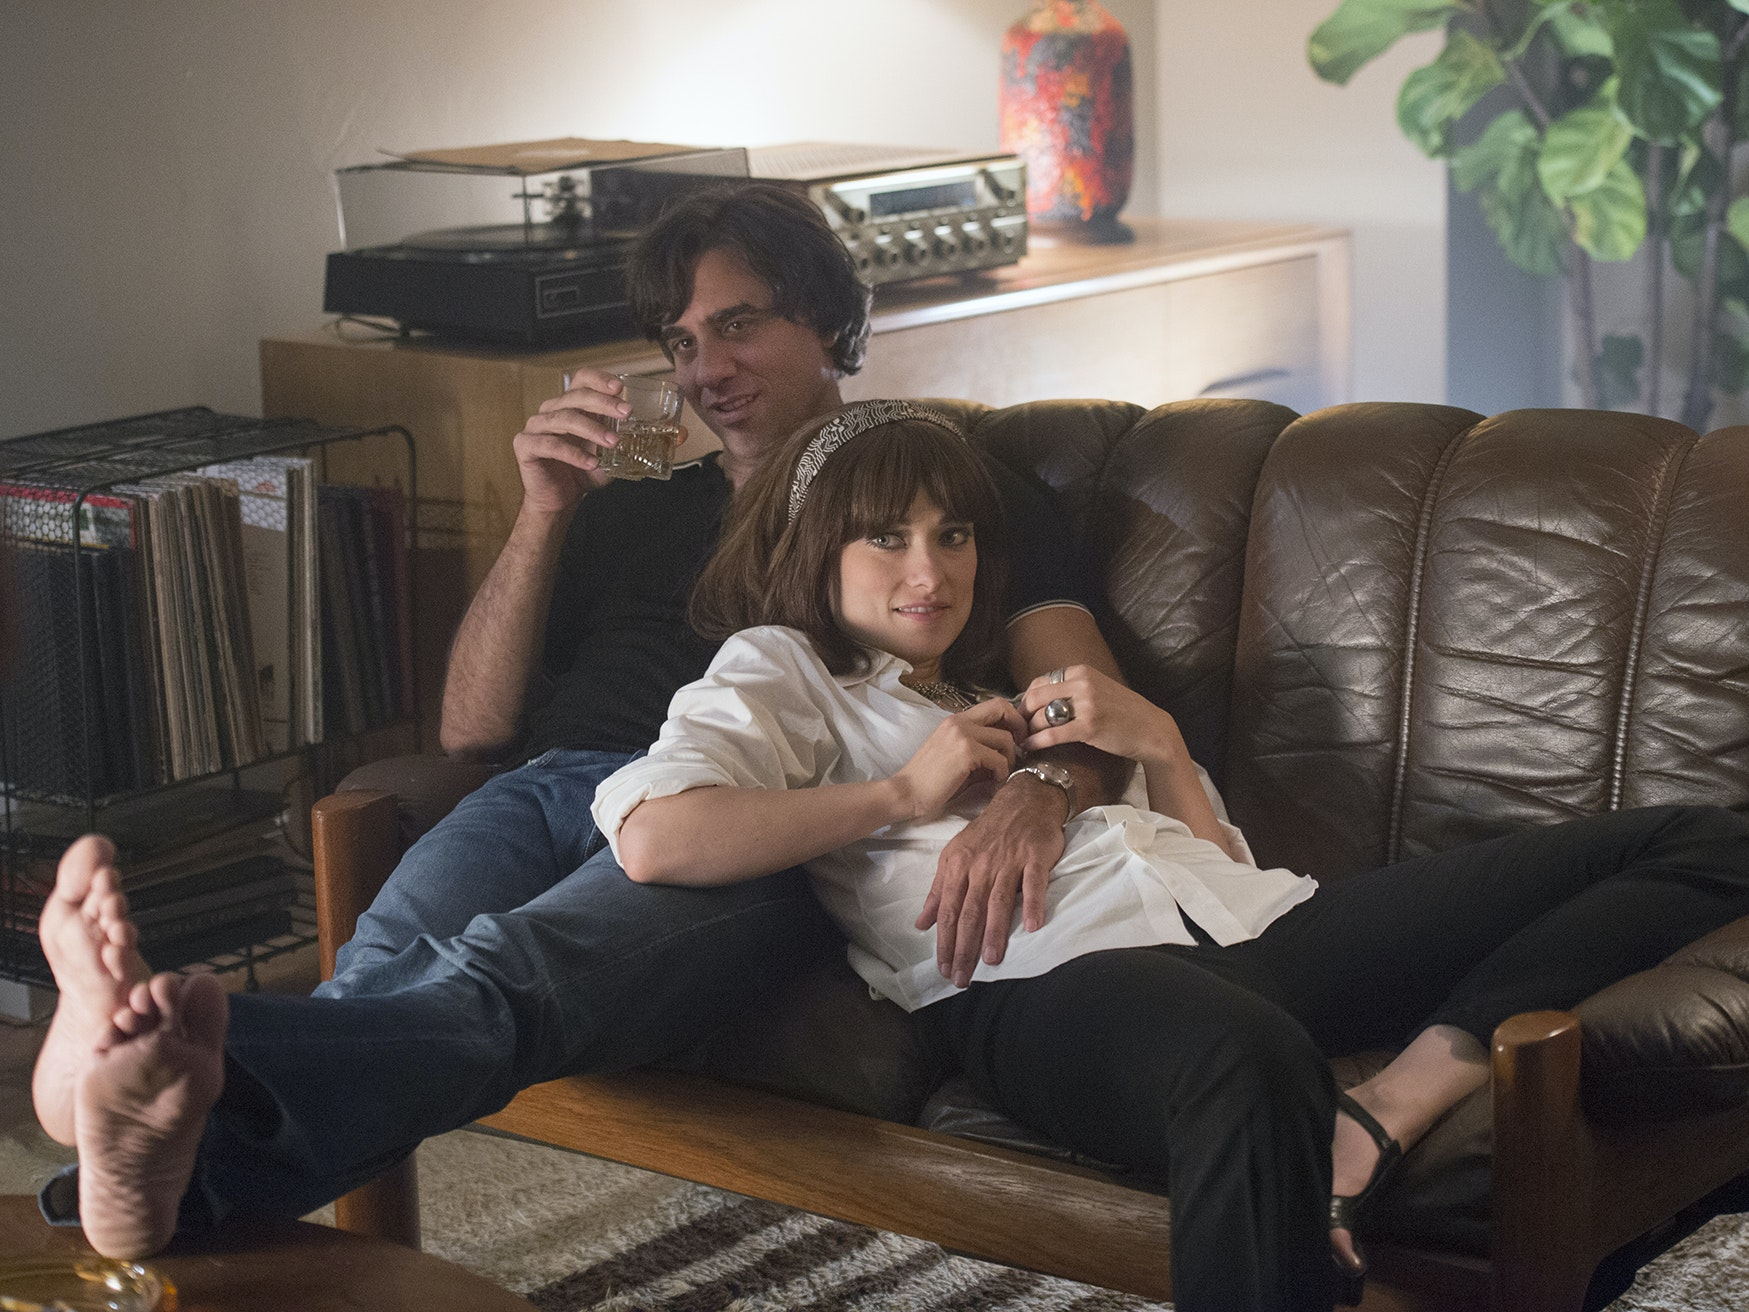 Vinyl, HBO, Episode 2, Bobby Cannavale, Martin Scorcese, Olivia Wilde